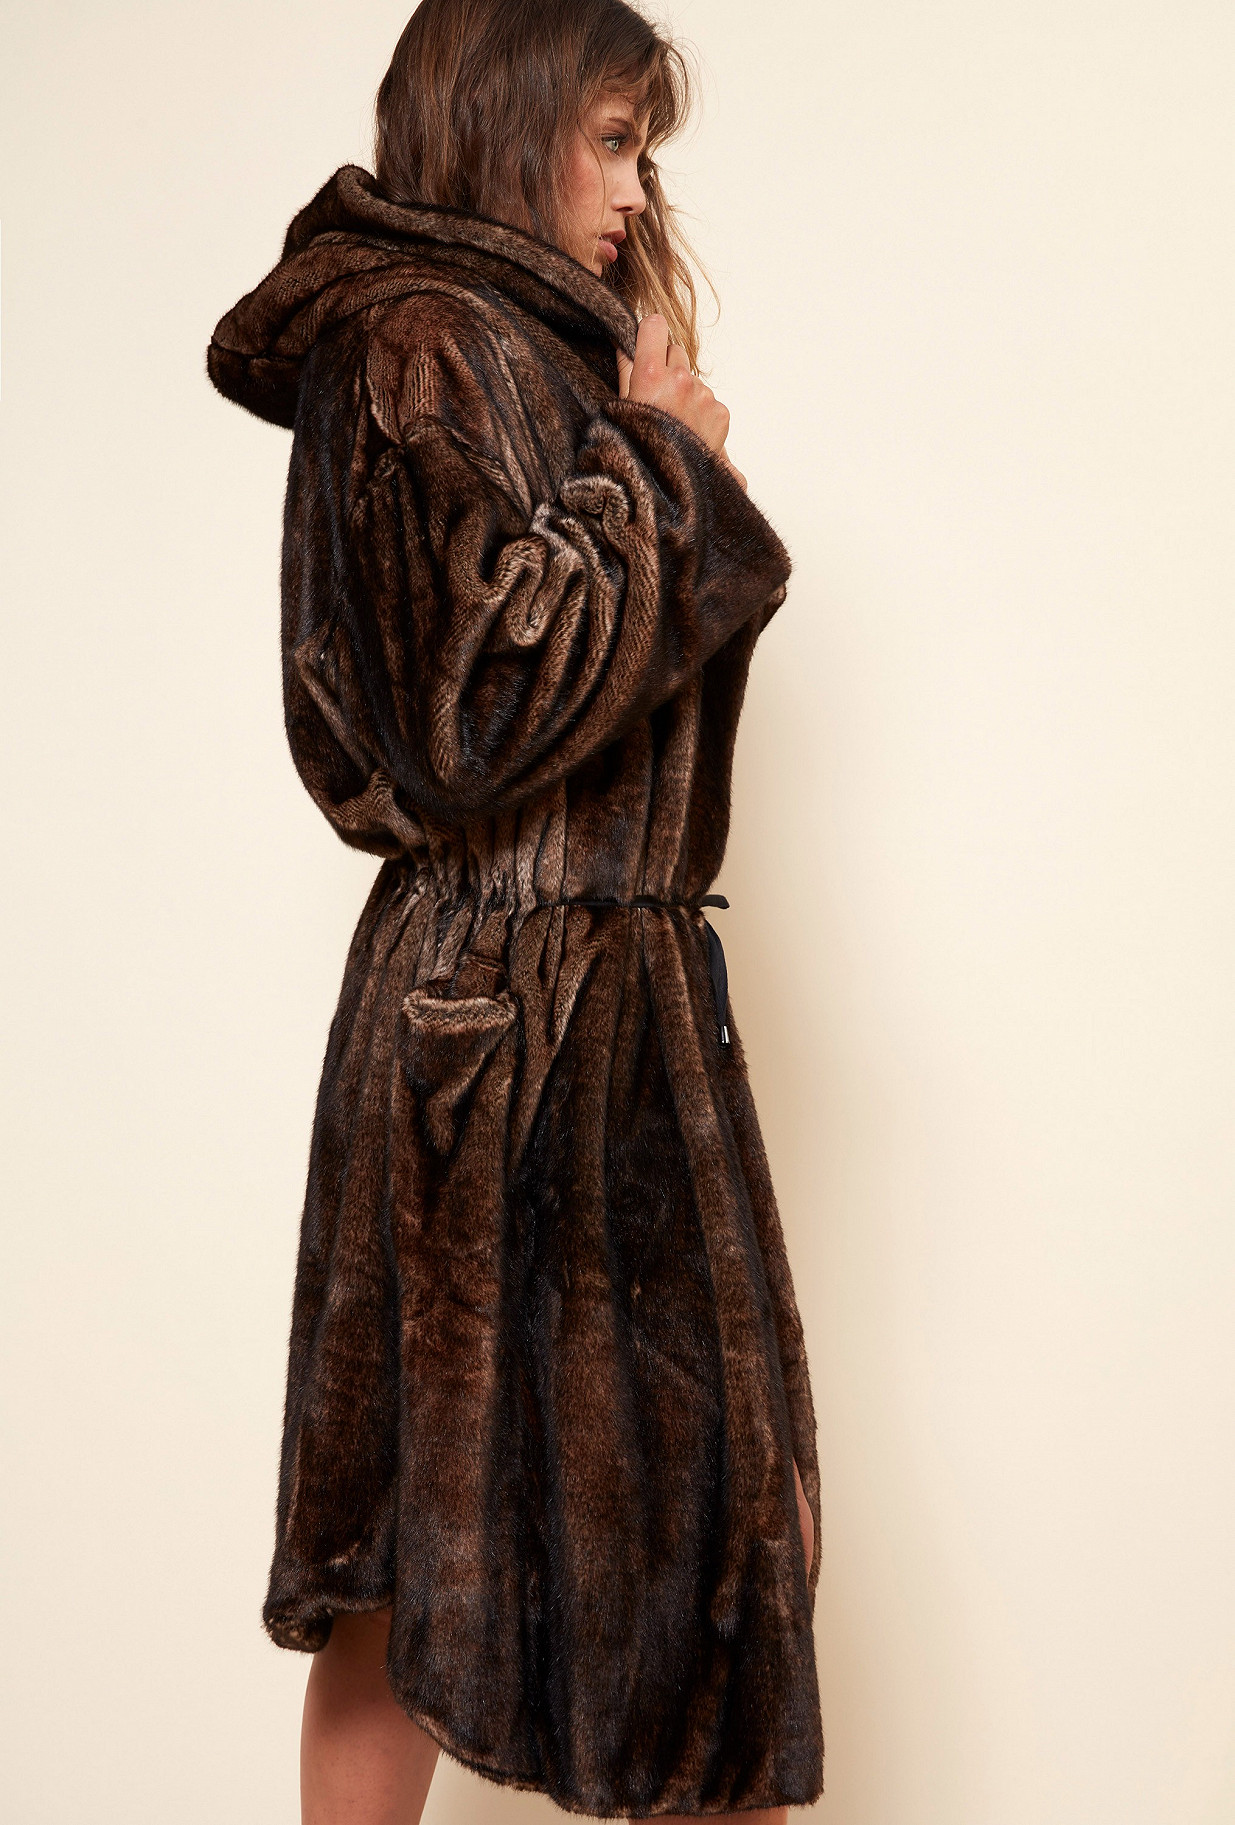 Brown  COAT  Mahogany Mes demoiselles fashion clothes designer Paris